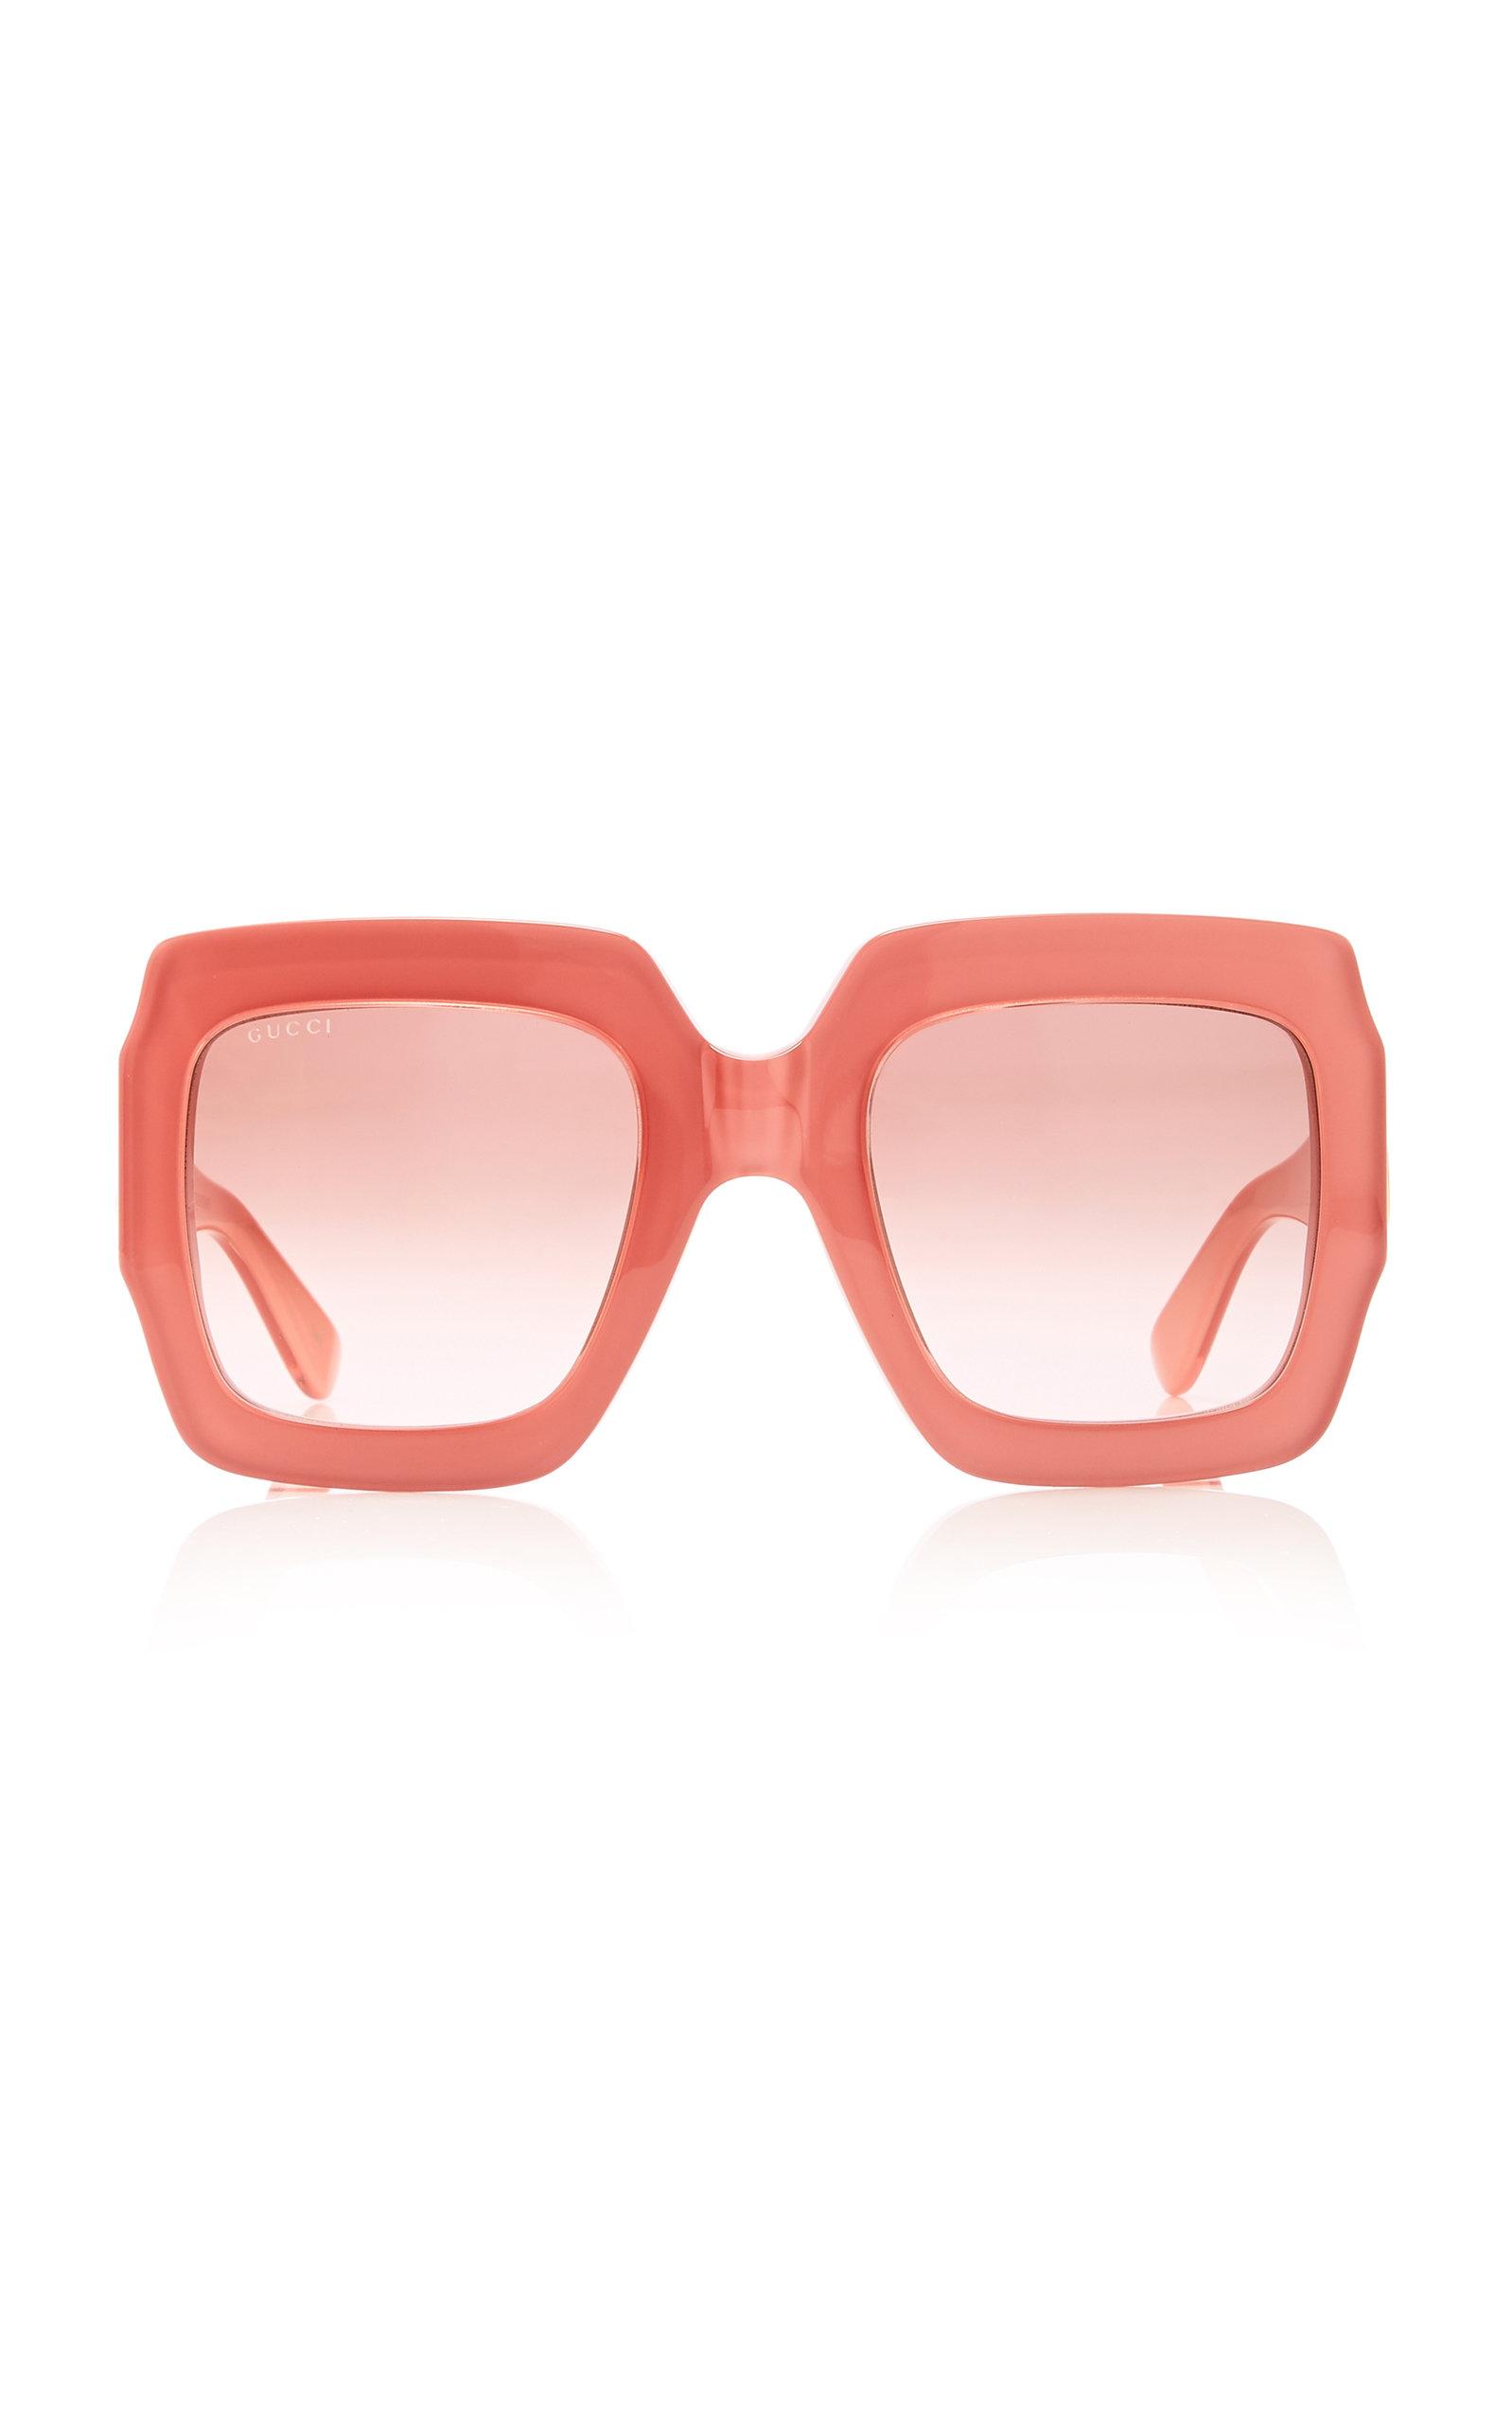 ebd7b33a8521 Gucci SunglassesPop Web Acetate Square-Frame Sunglasses. CLOSE. Loading